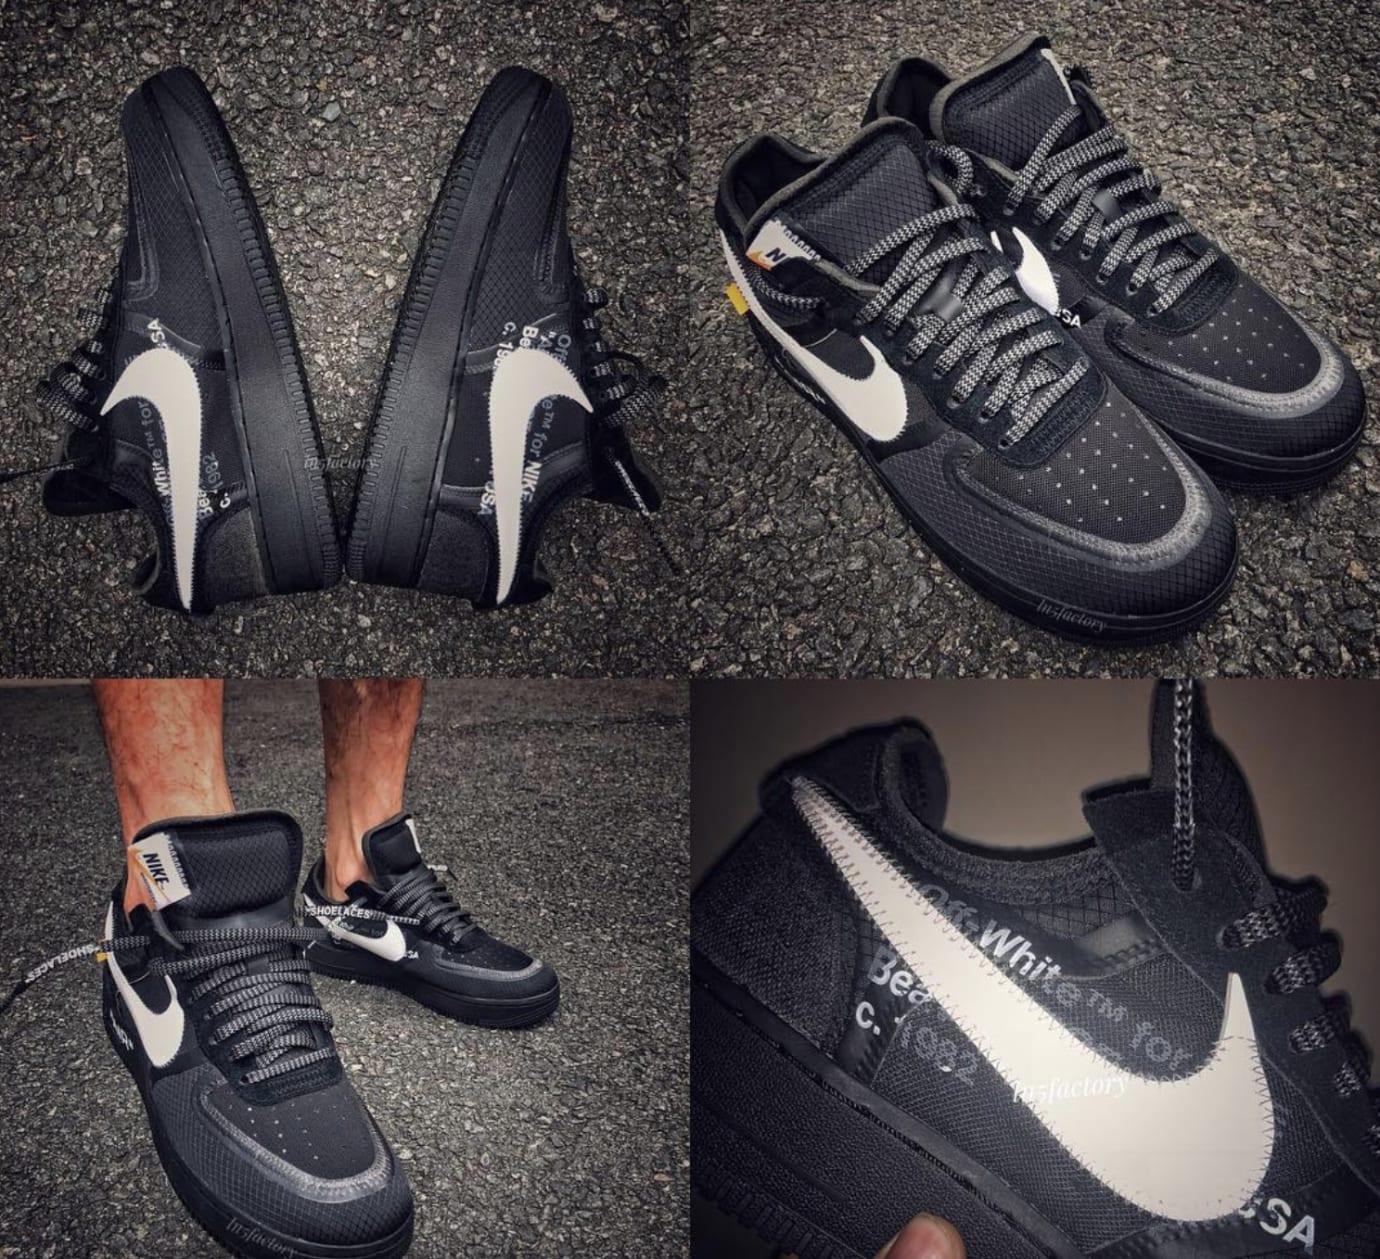 e4d37a8643587 Image via ln5factory · Off-White x Nike Air Force 1 Low  Black White  AO4606 -